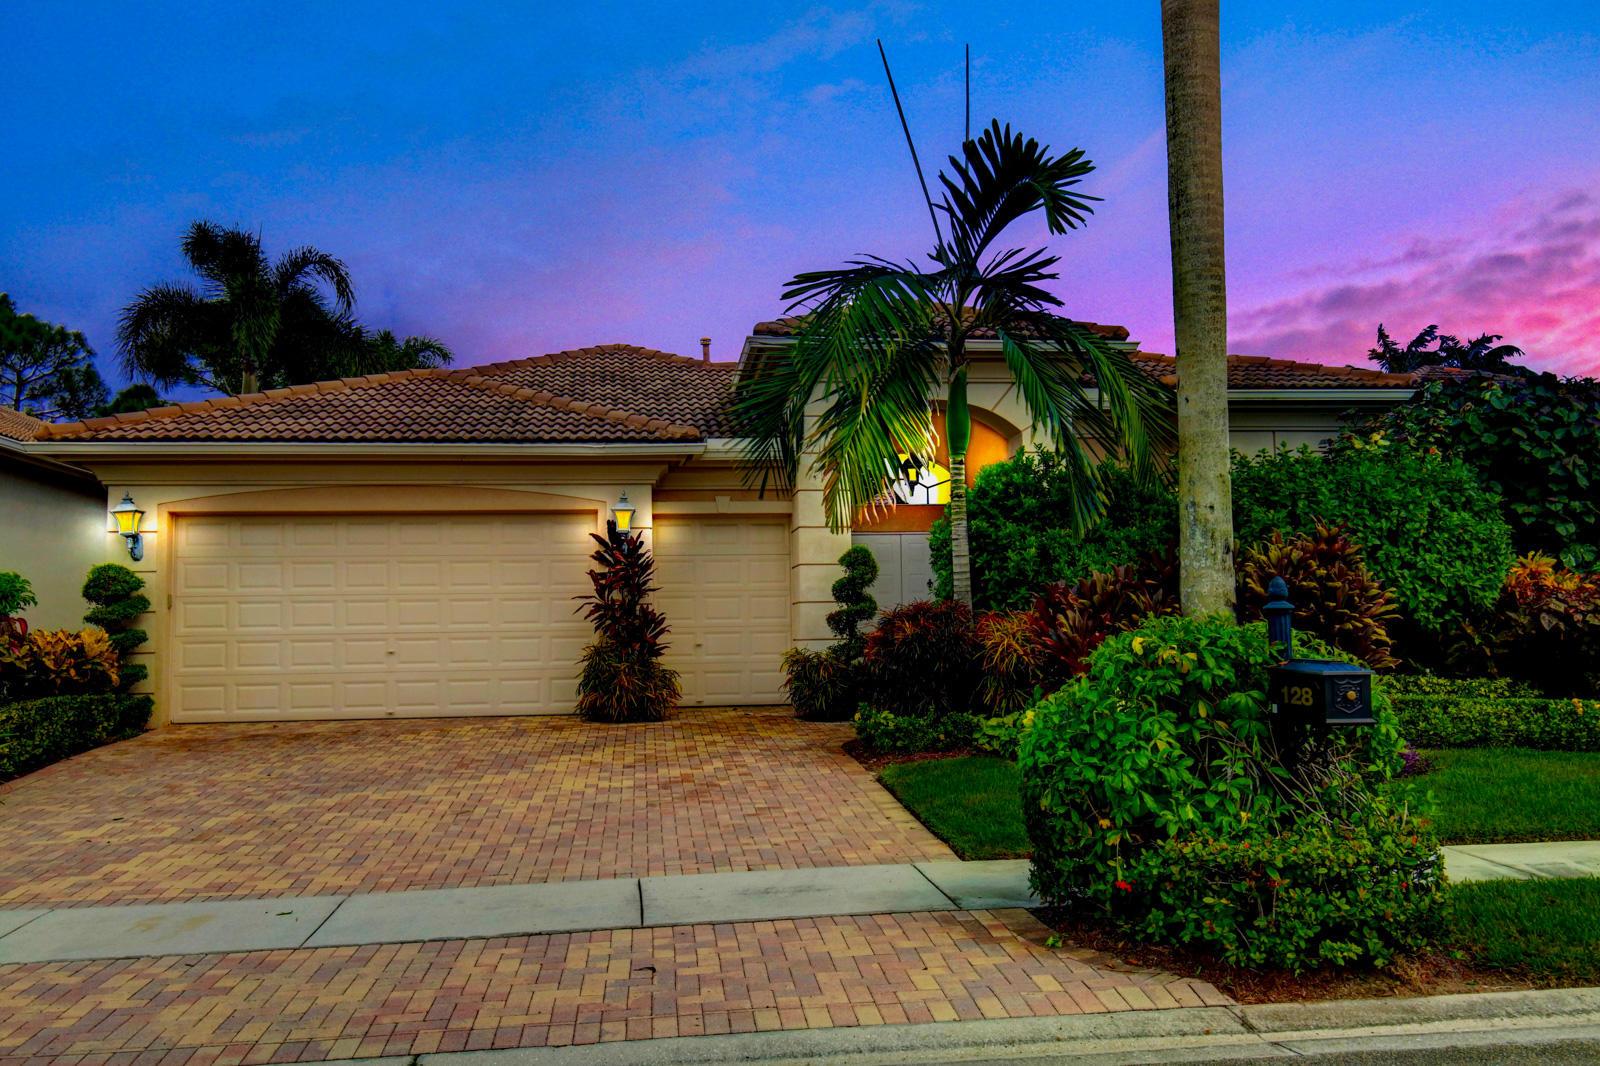 128 Abondance Drive, Palm Beach Gardens, Florida 33410, 4 Bedrooms Bedrooms, ,3.1 BathroomsBathrooms,A,Single family,Abondance,RX-10466762